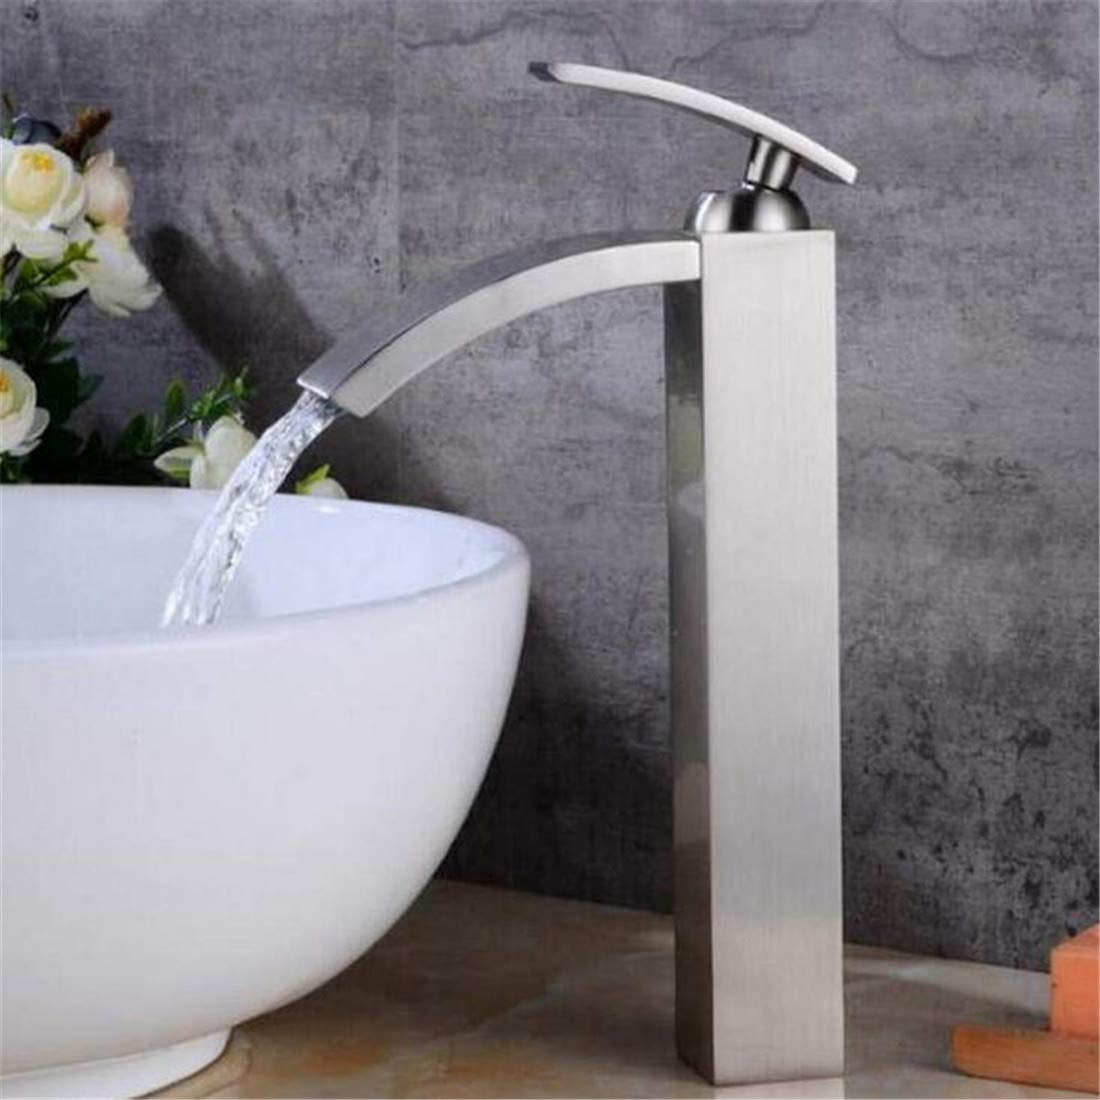 Kitchen Bath Basin Sink Bathroom Taps Bronze Bathroom Faucet Tall Single Handle Mixer Water Ta P Ctzl4092 Janitorial & Sanitation Supplies